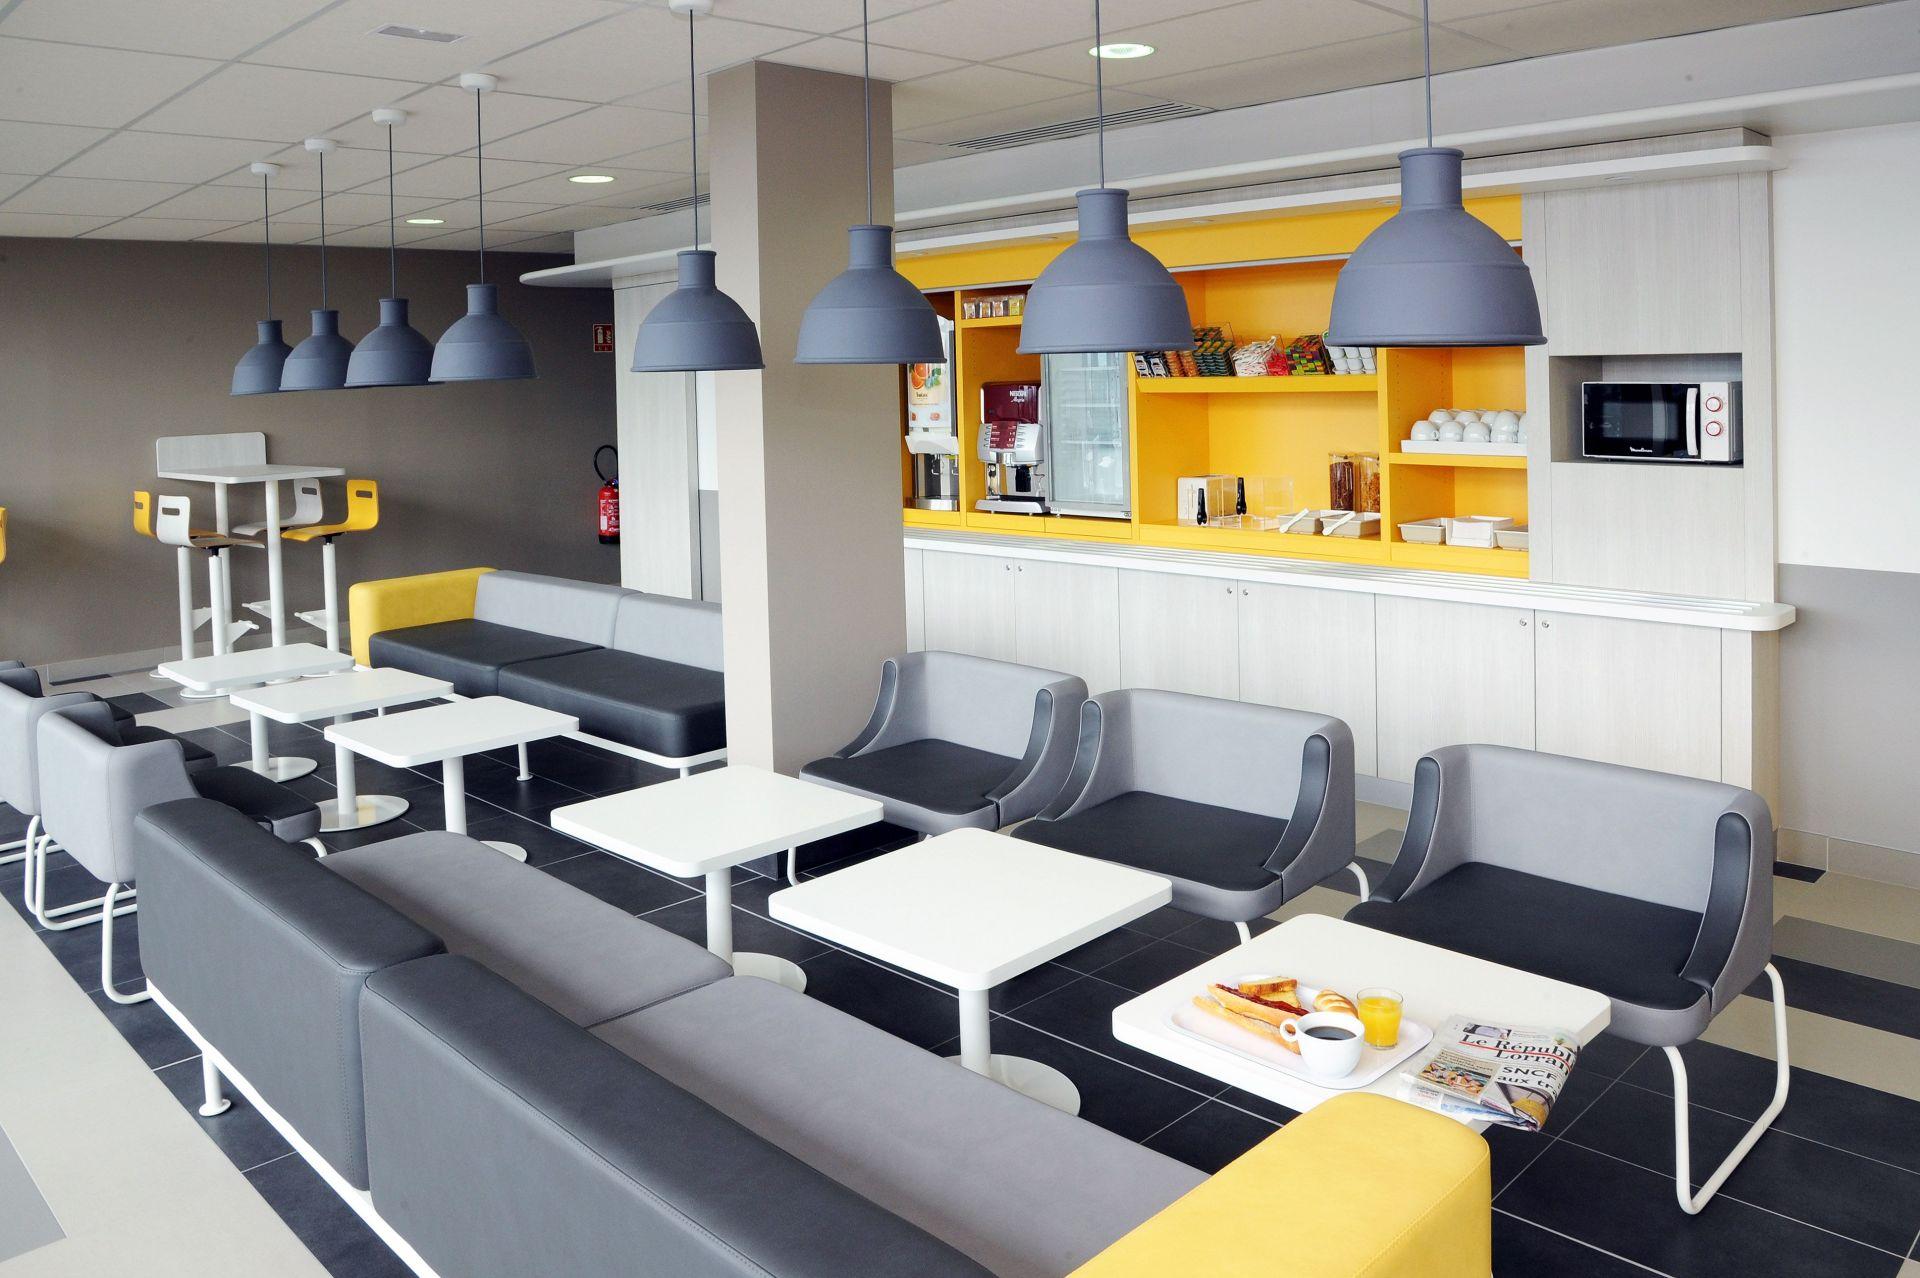 H tel premi re classe lorraine tourisme for Hotels premiere classe